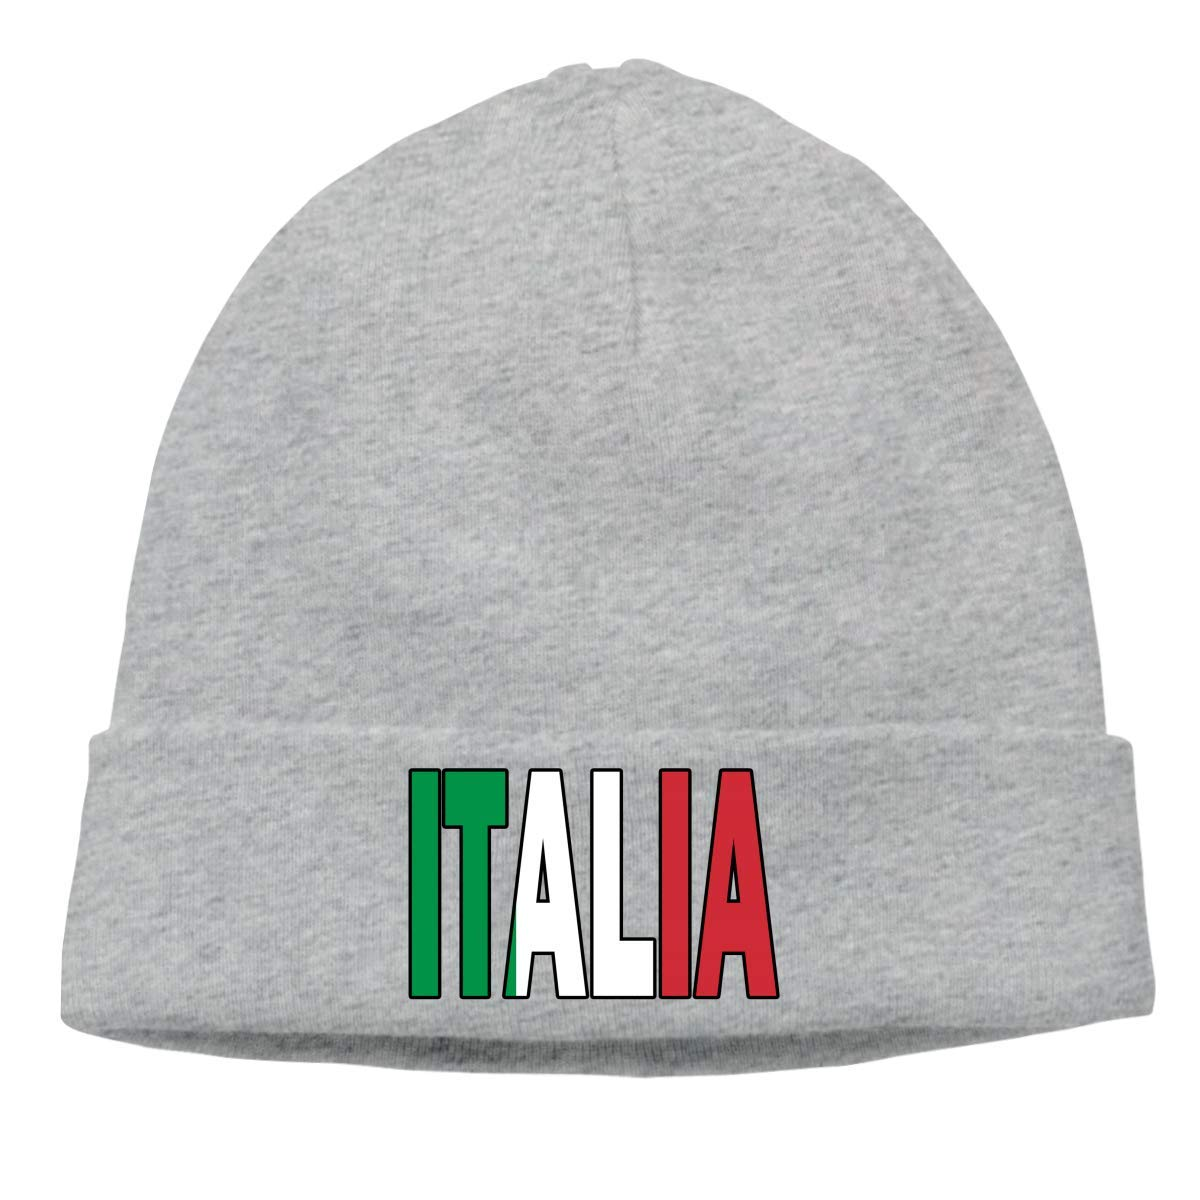 Italia Flag Italian Ski Cap Keep warm 17849 hgdfhfgd Casual Knit Cap for Unisex